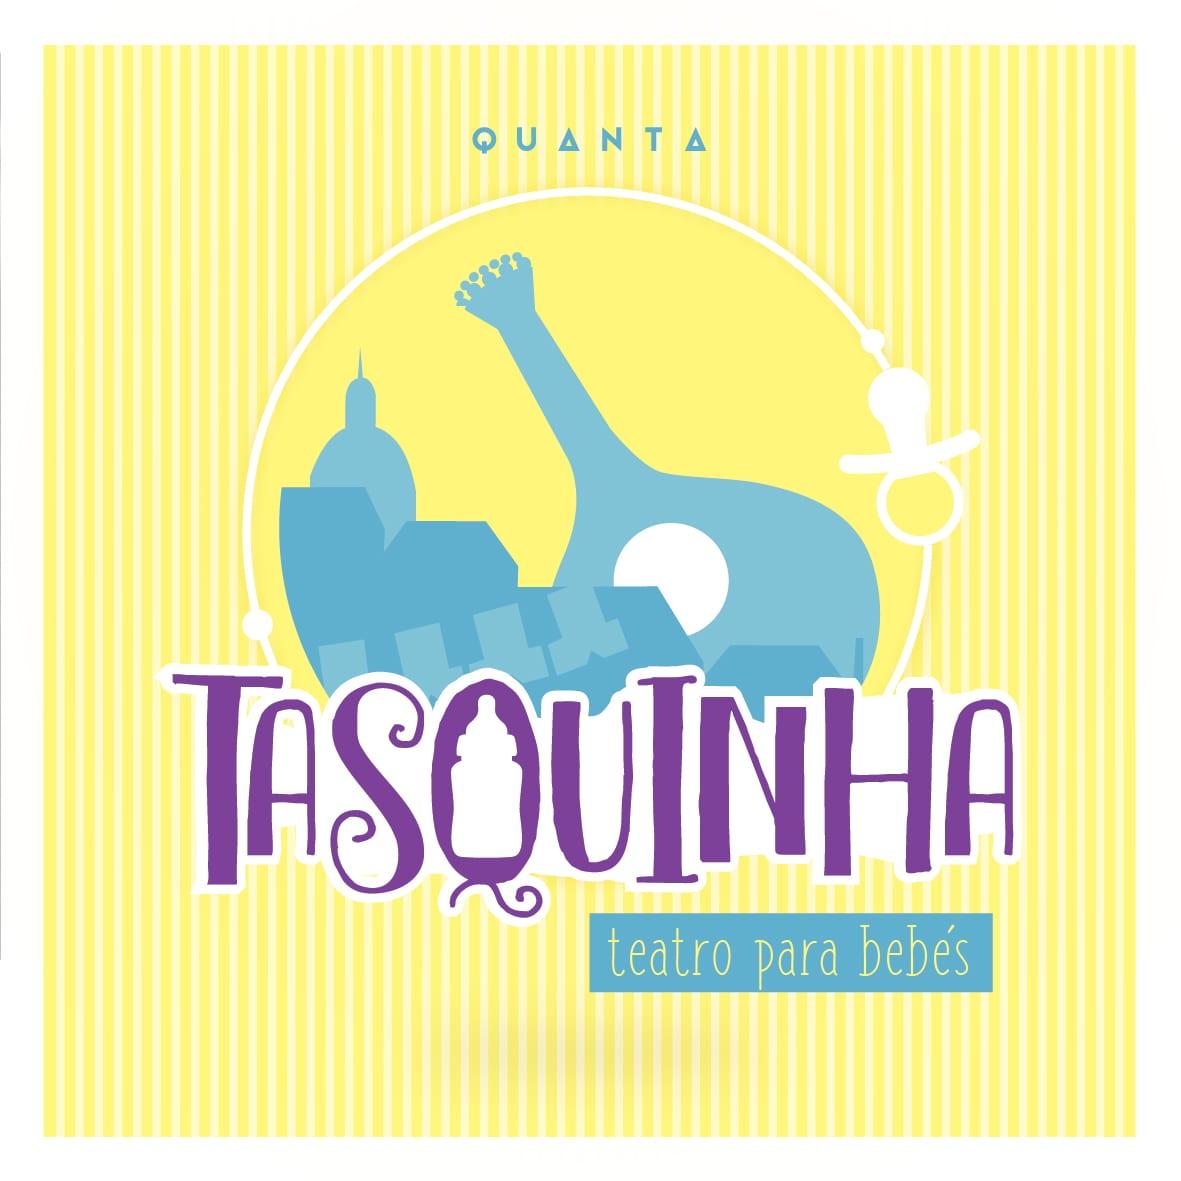 TASQUINHA | Teatro para Bebés